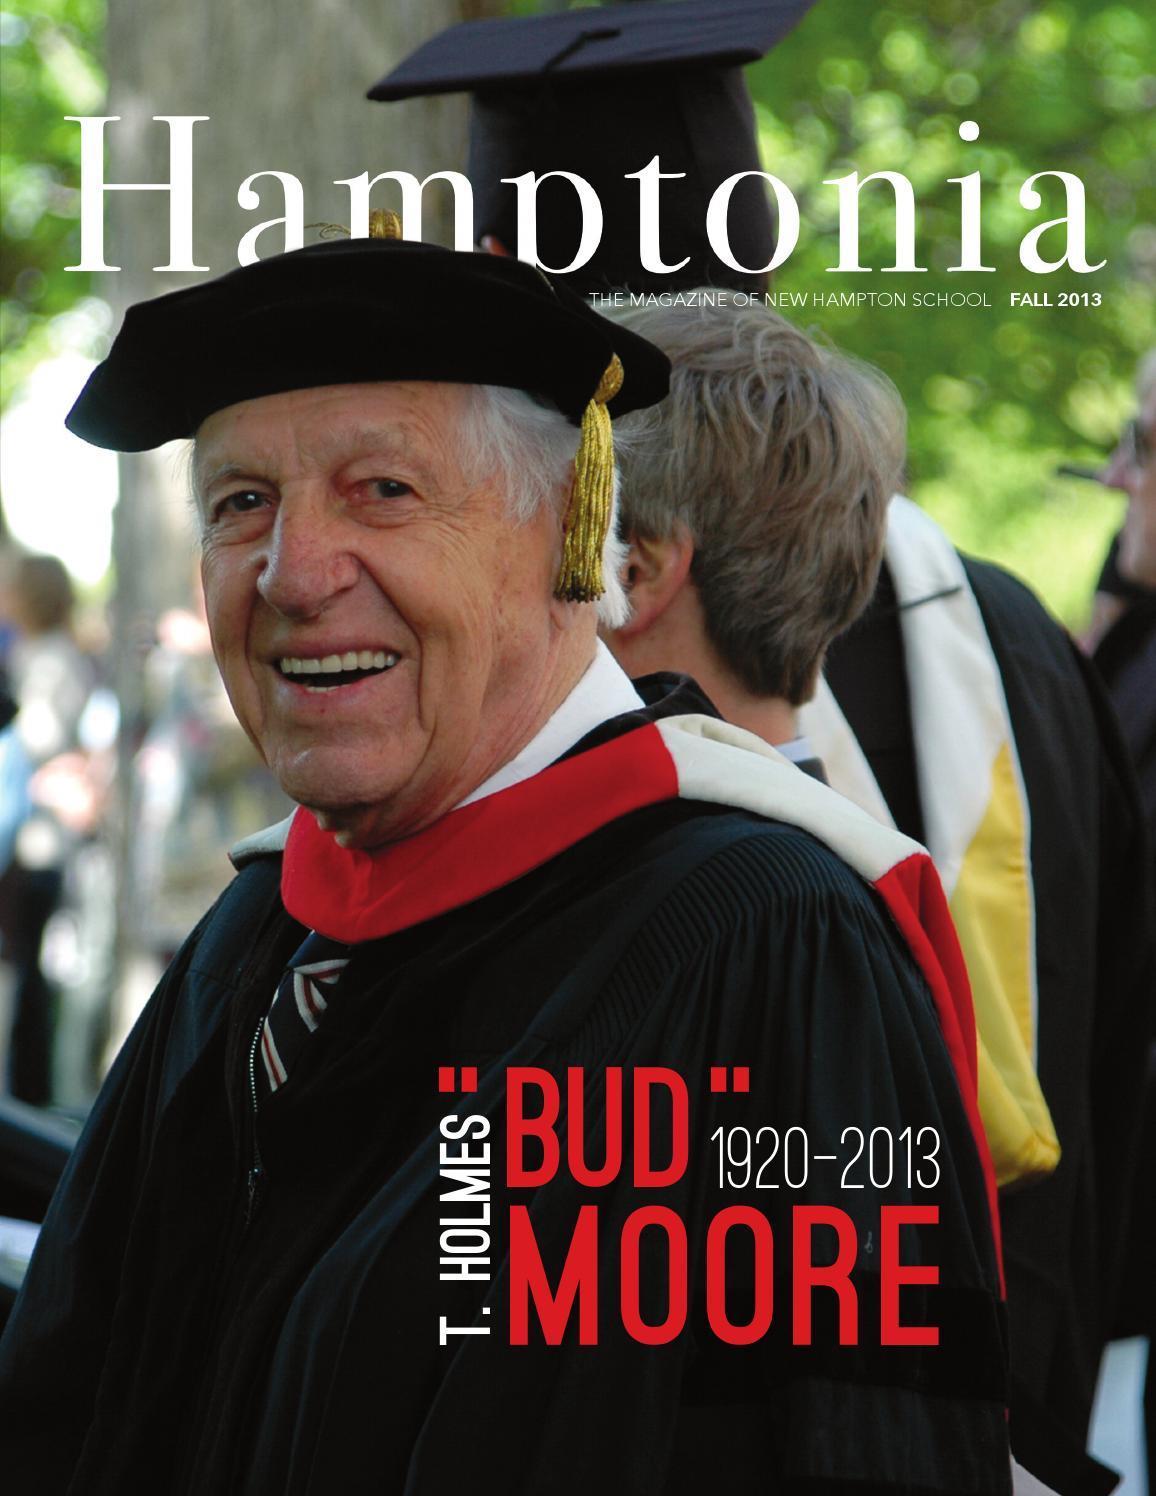 78f7c37e69e Fall 2013 Hamptonia  The Magazine of New Hampton School by New Hampton  School - issuu